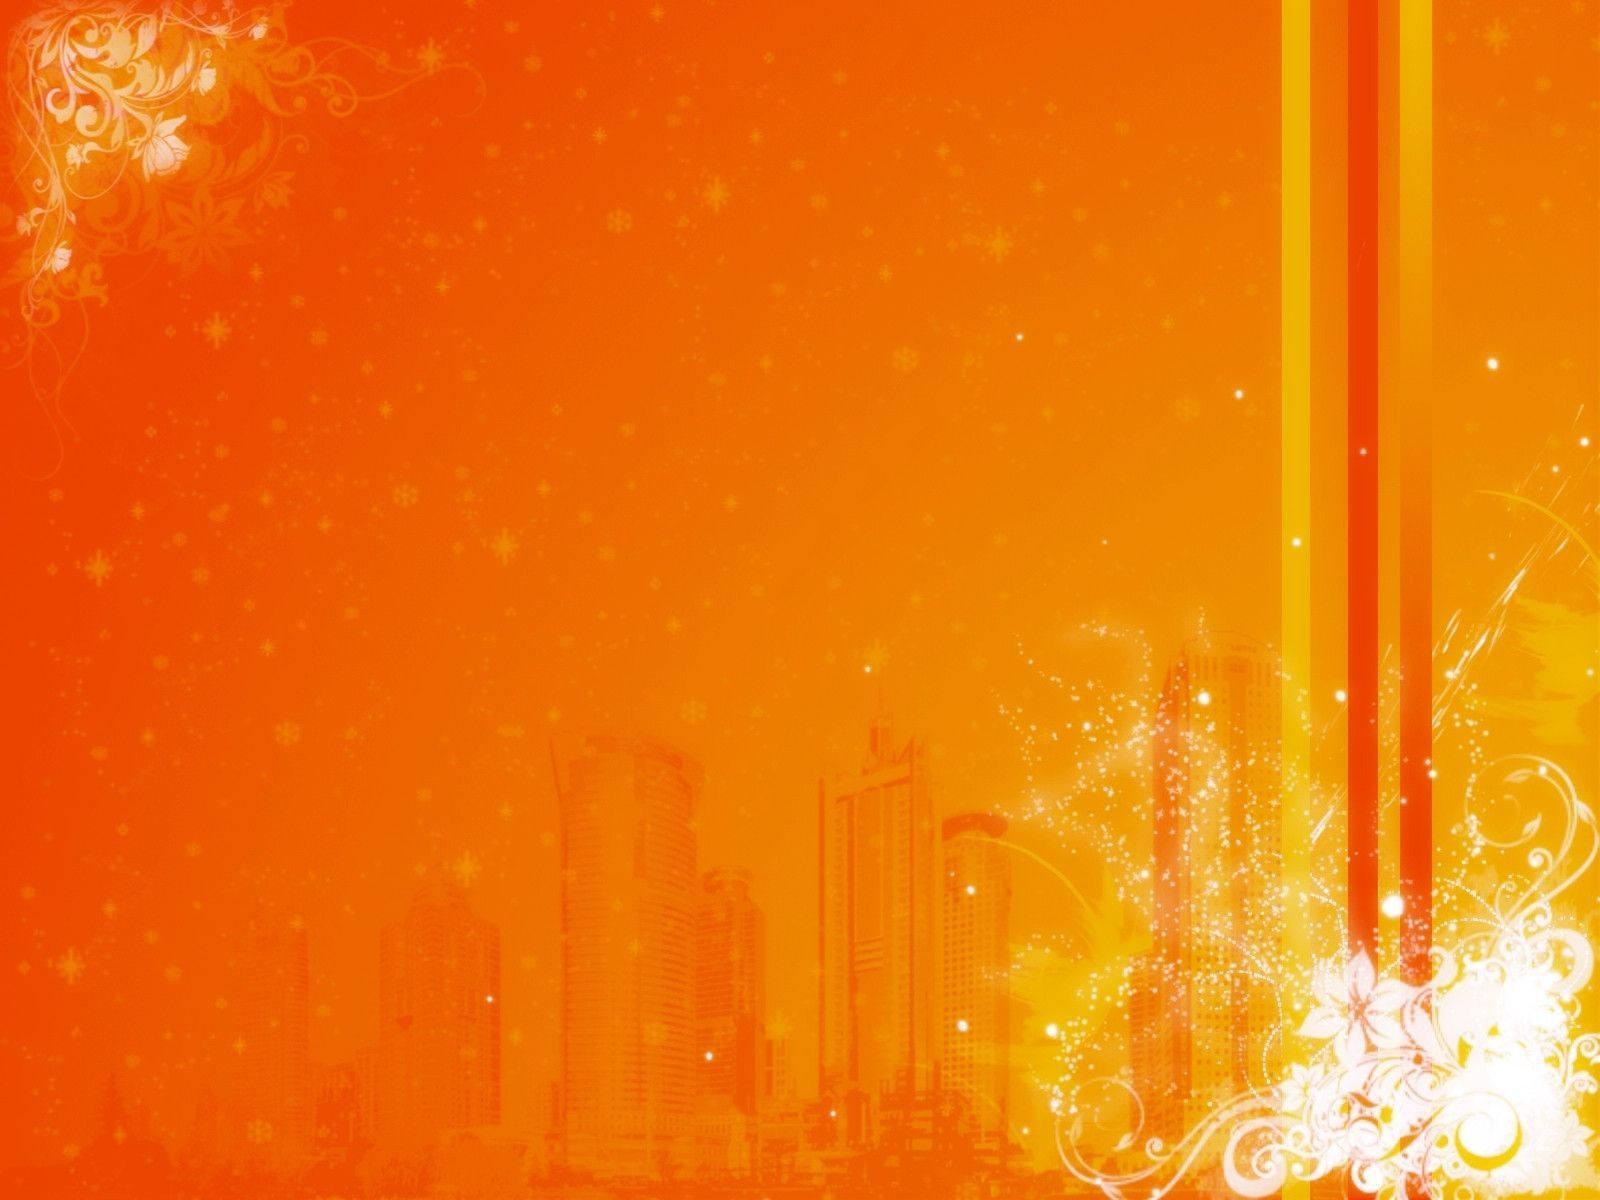 Orange backgrounds   SF Wallpaper 1600x1200